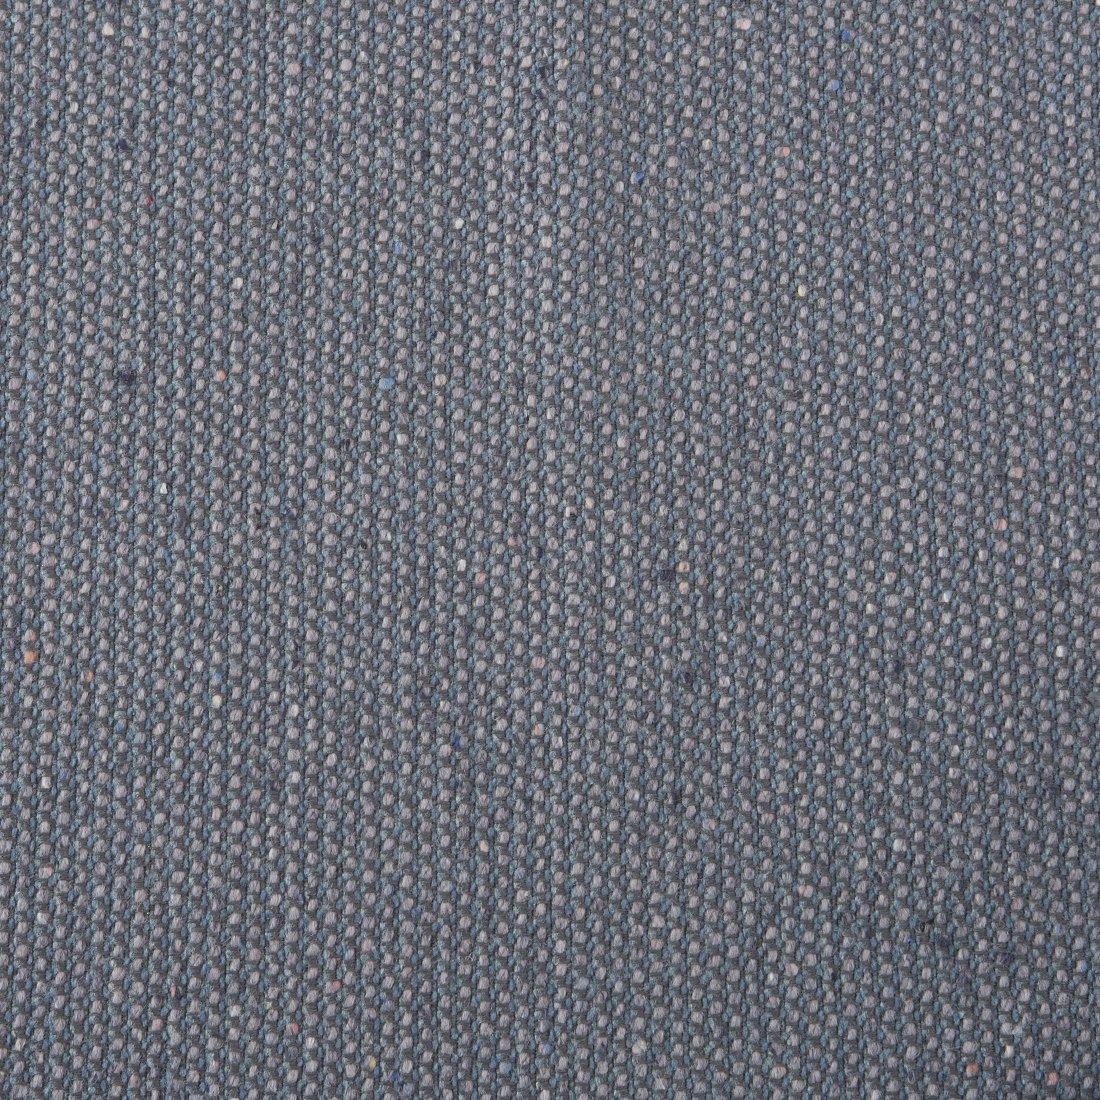 Amazon Com Wedgewood Wool Grey Blue Solid Woven Wool Upholstery